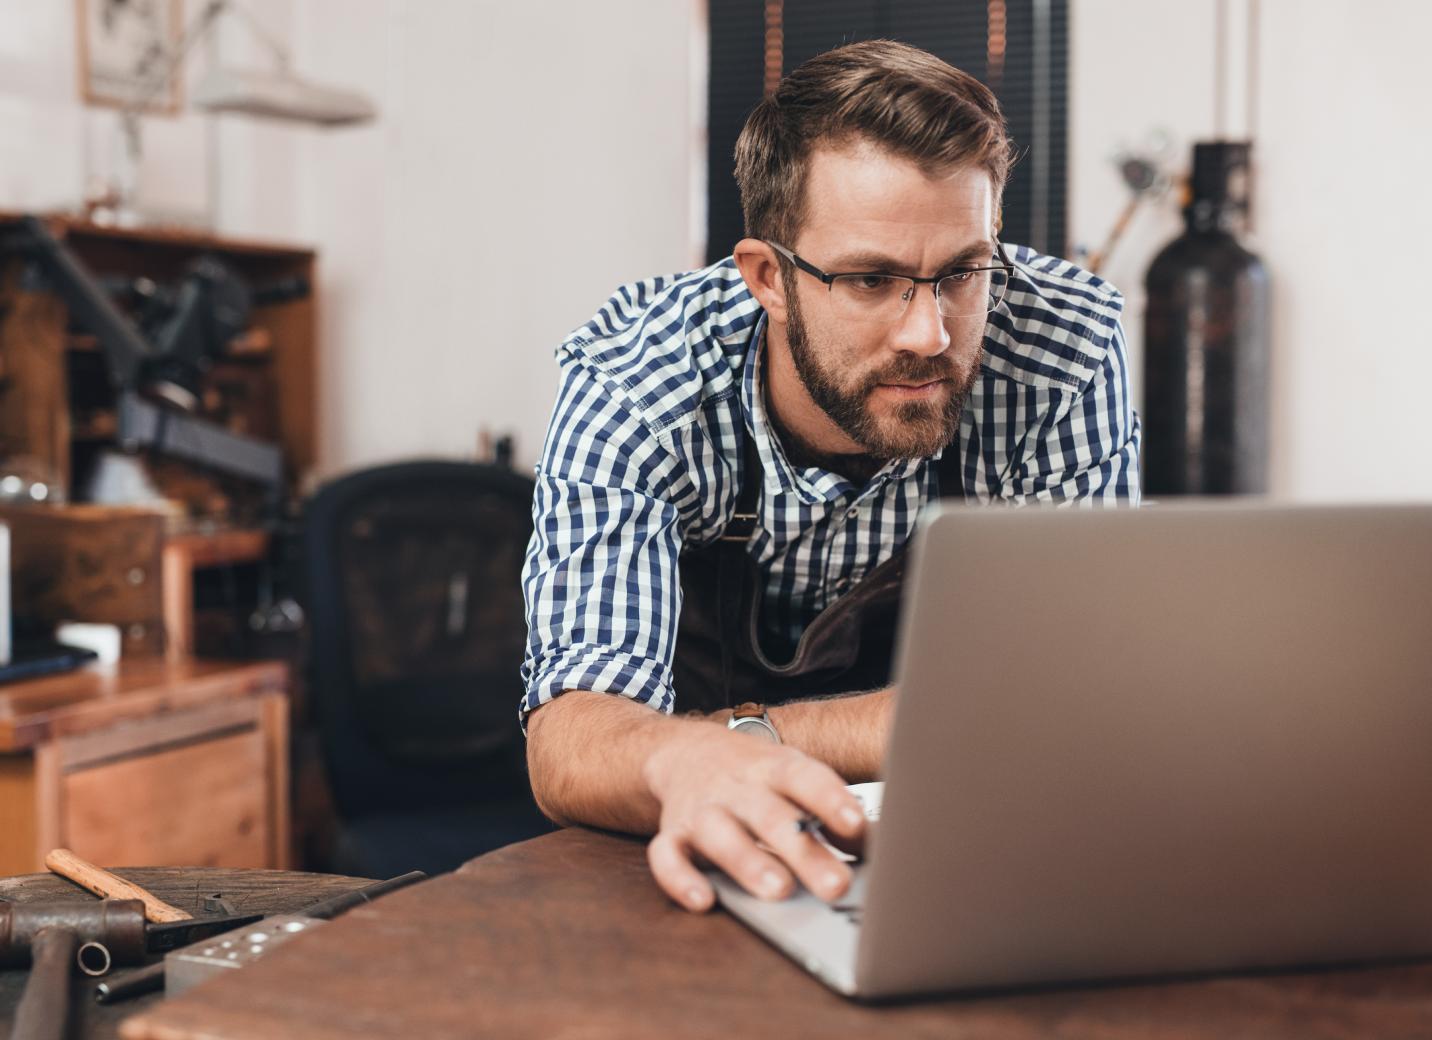 How digital bill payment solutions help maximize cash flow